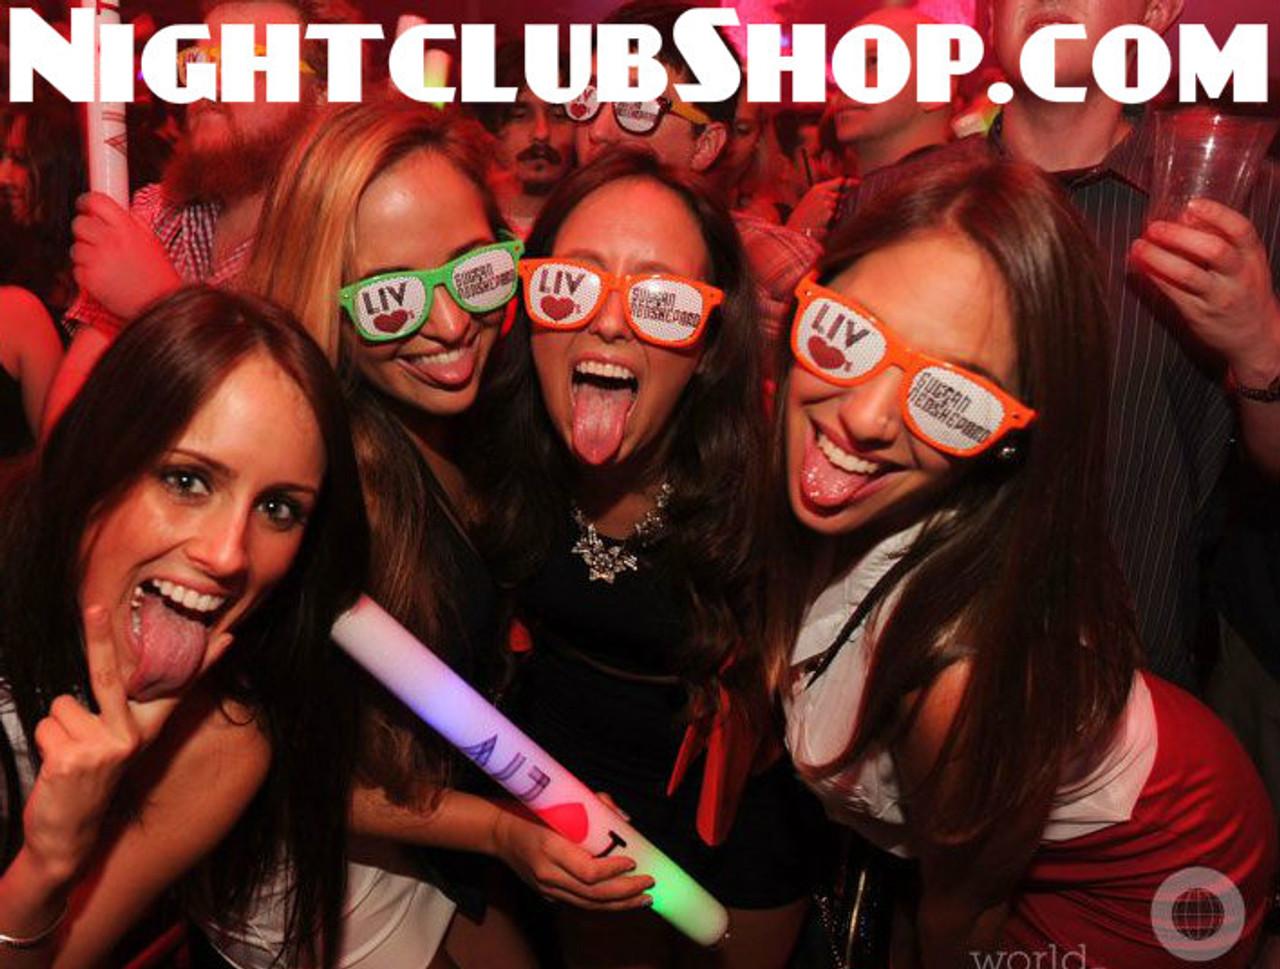 LED FOAM STICK, 18 inch, EDM,LITE STICKS,FOAM STICKS,FOAM STIX, L.E.D.Stix, Light sticks,LED, FOAM, lite, light, sticks, stix, club, rave, party, dance